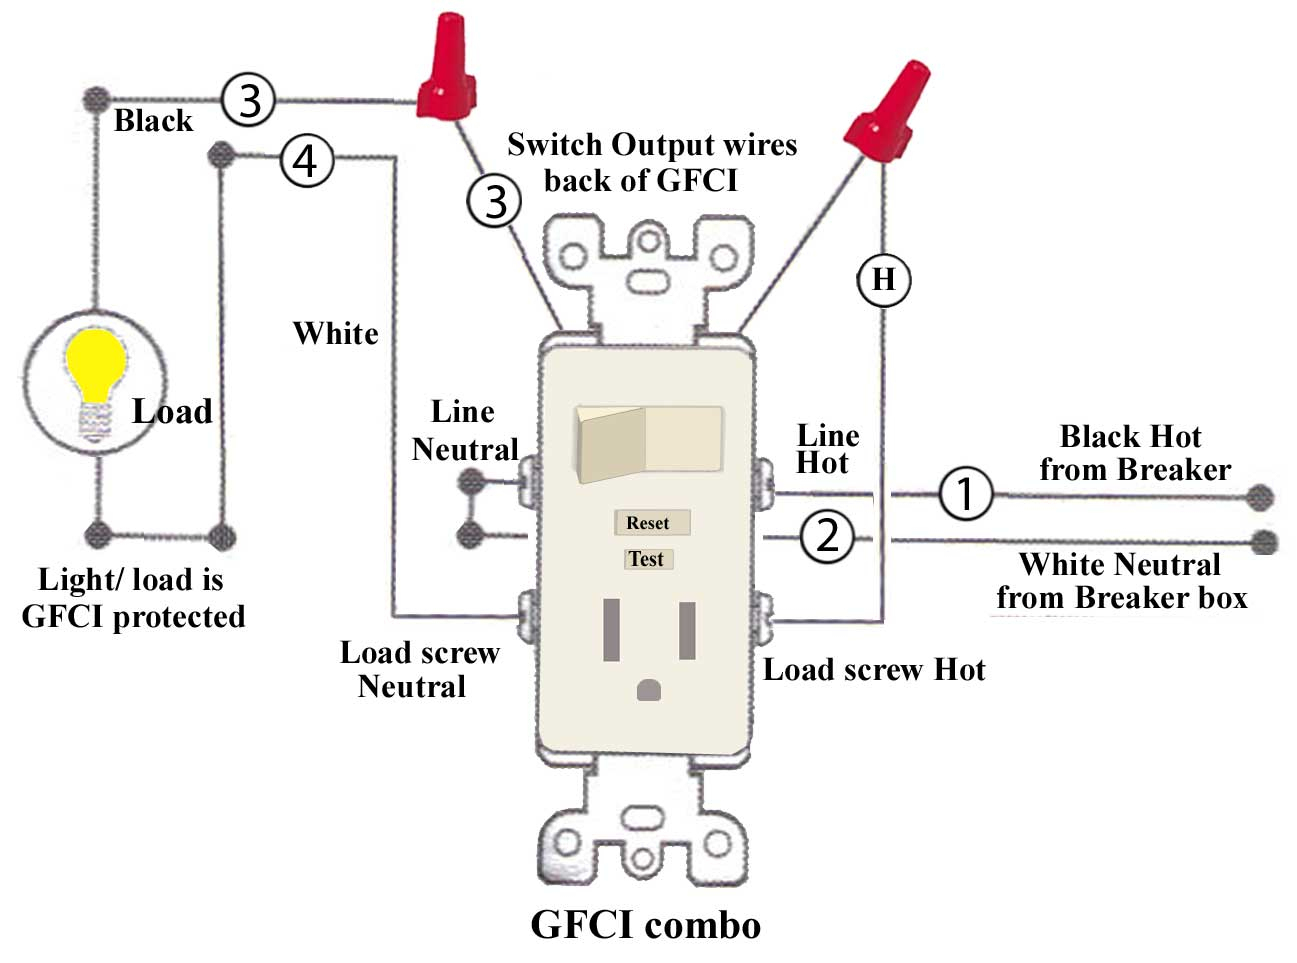 Gfci Wiring On | Wiring Diagram - Gfci Wiring Diagram